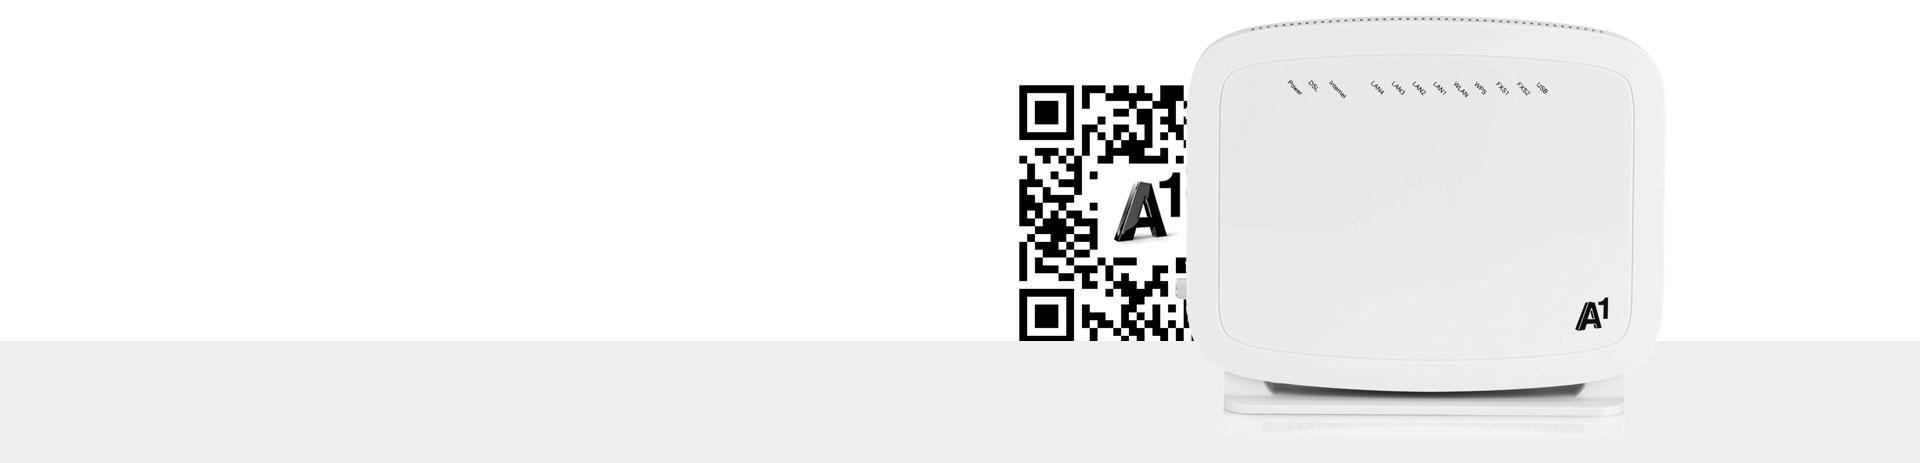 A1 Service Pickerl - Festnetz Internet Modem